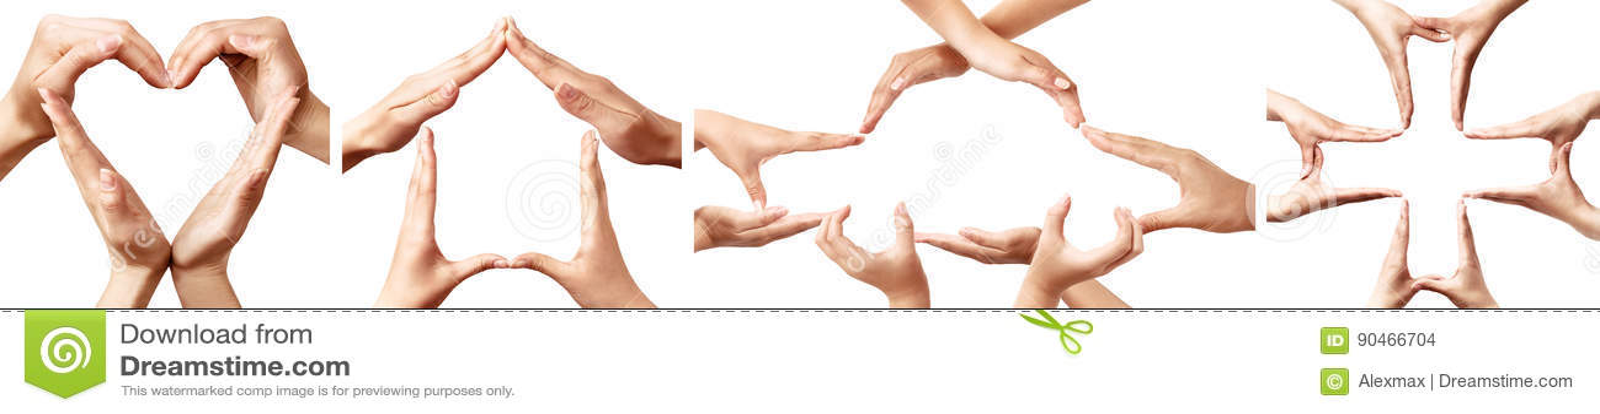 Hand Symbols Representing Concepts Of Insurance Stock Illustration